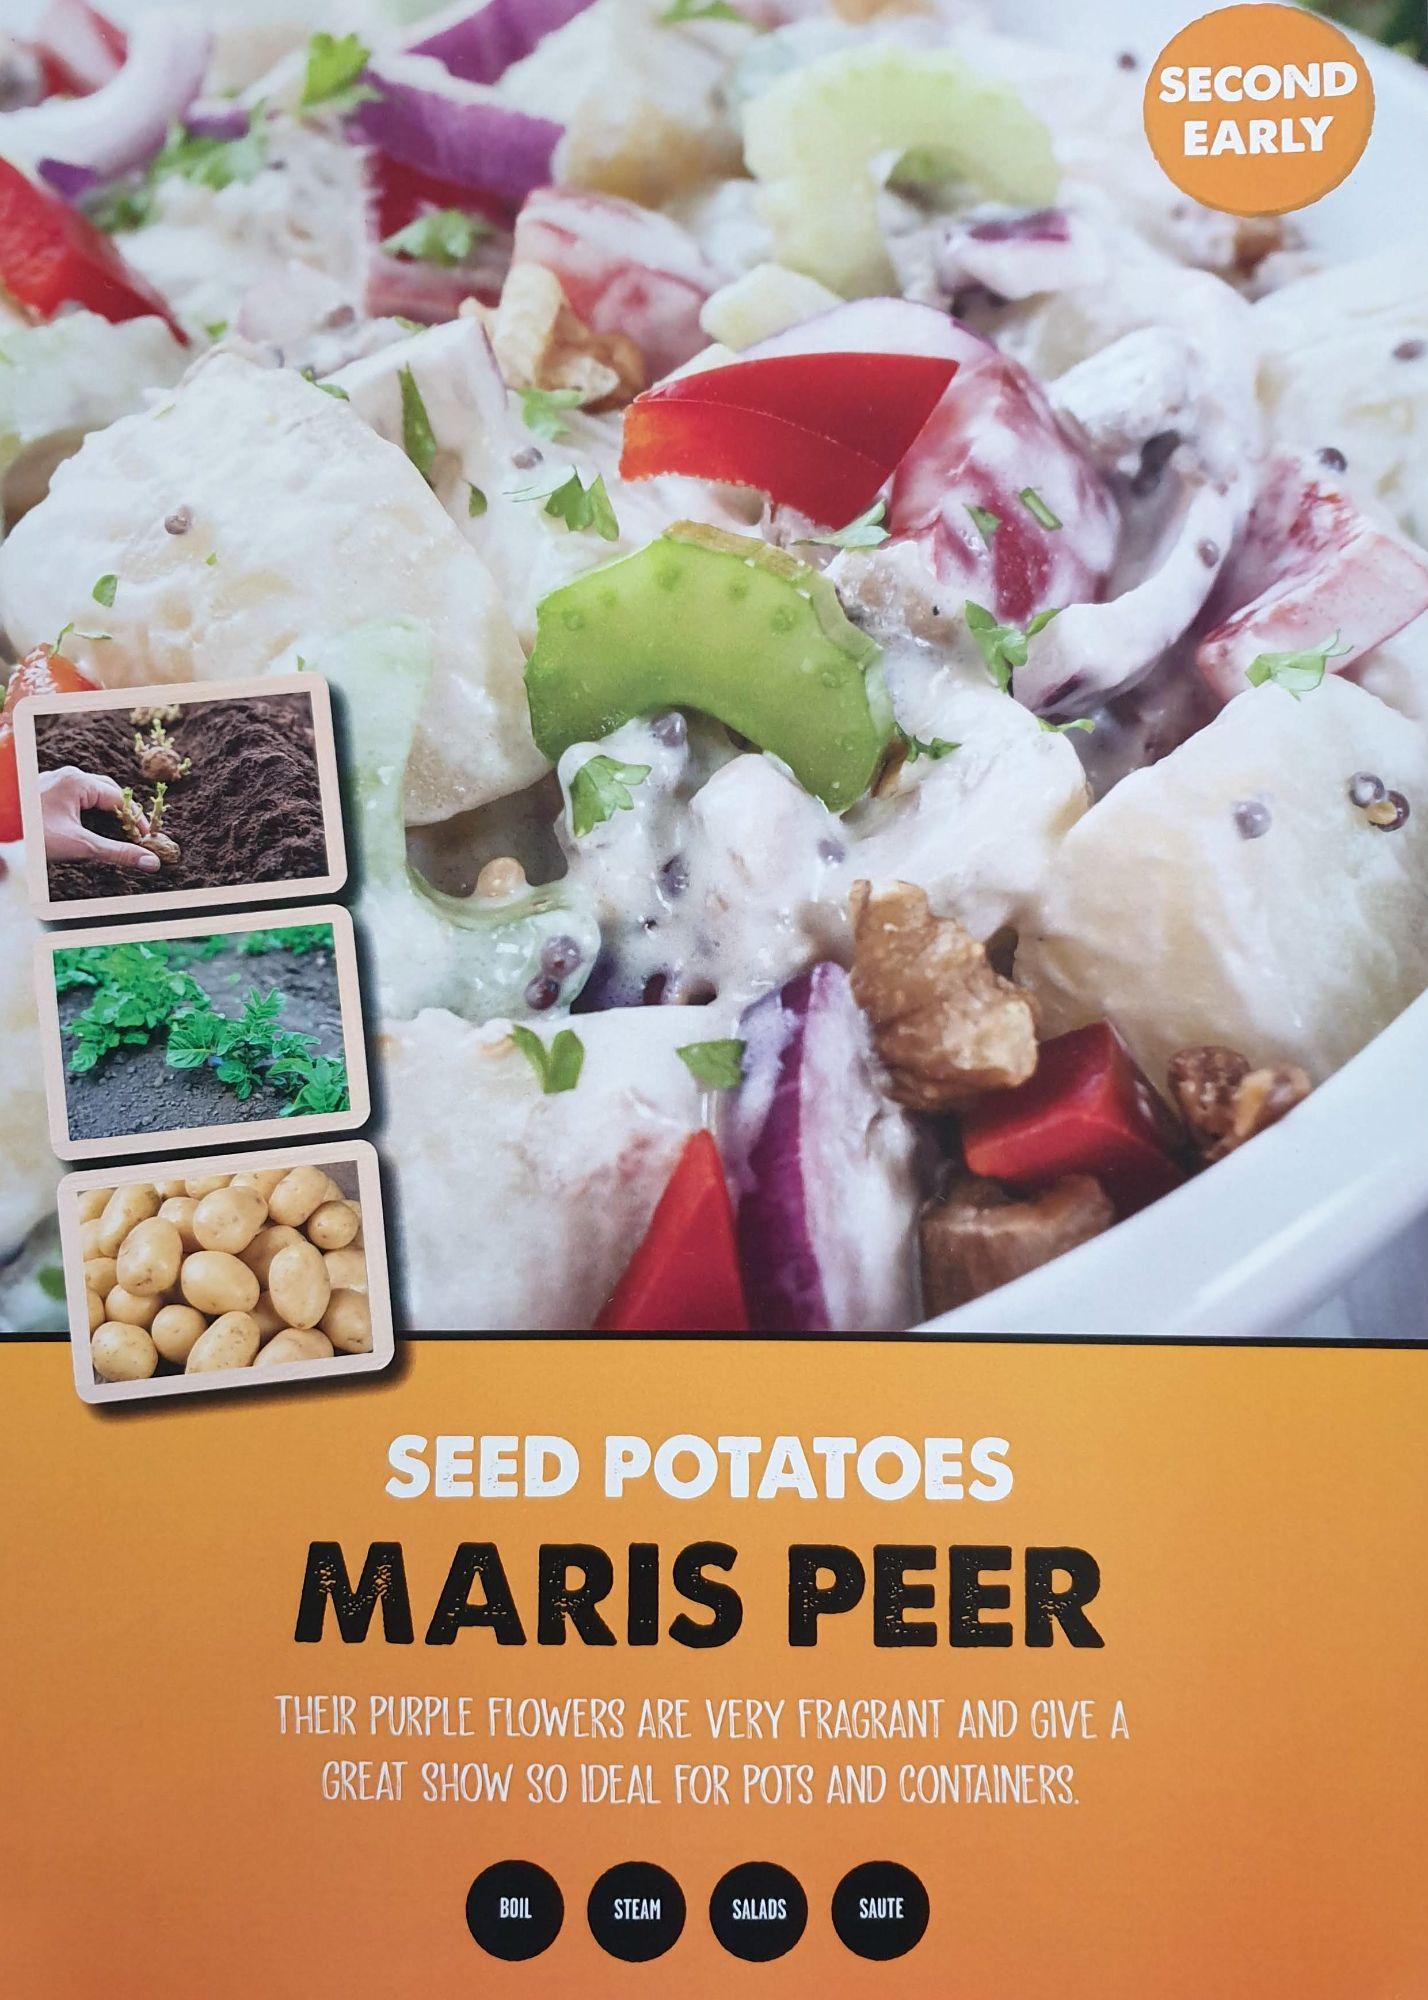 maris_peer_seed_potaot_info.jpg